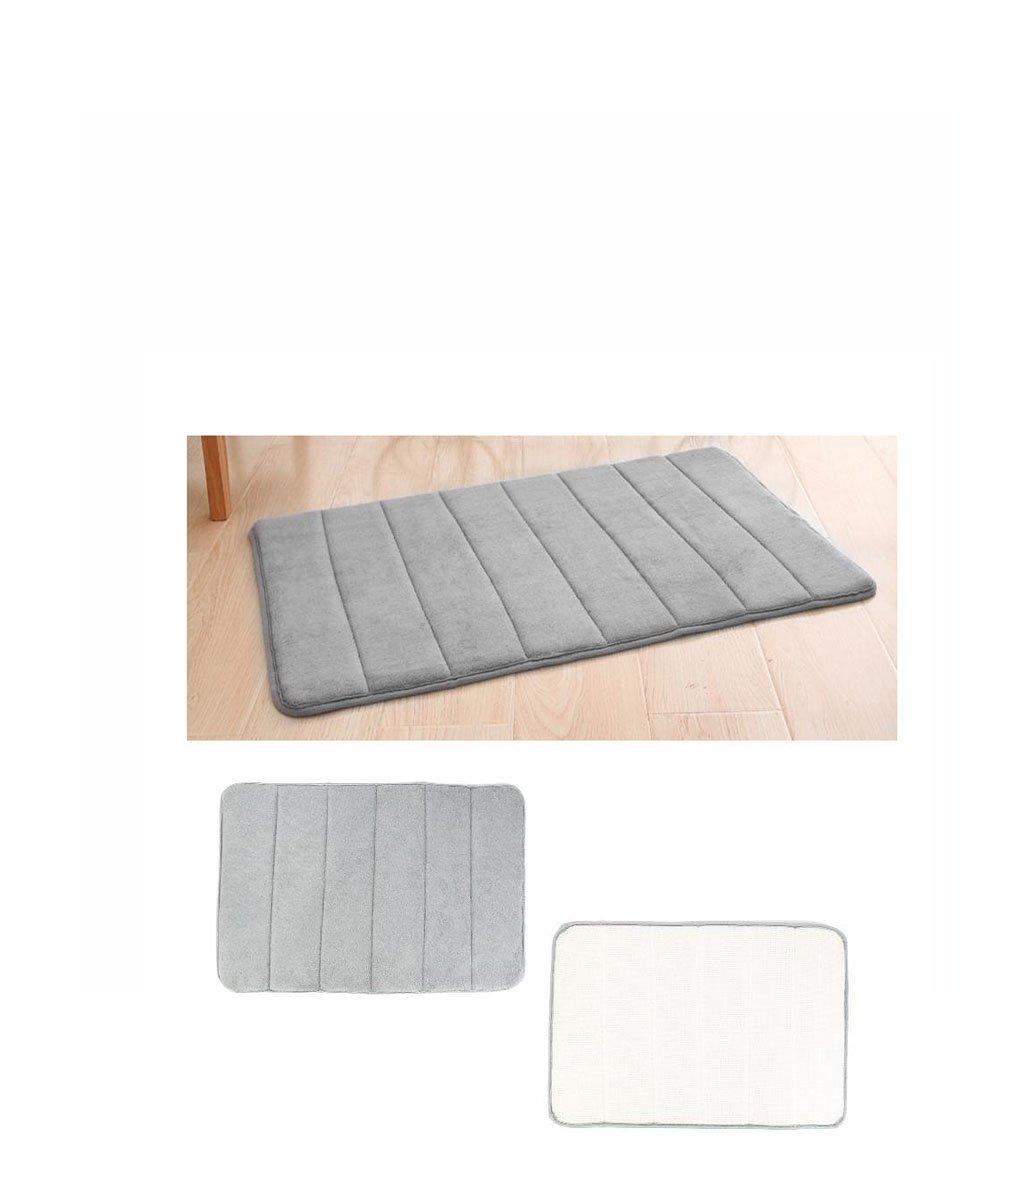 Buy Foam Slip Bath Mat Mexten Product Is Of High Quality